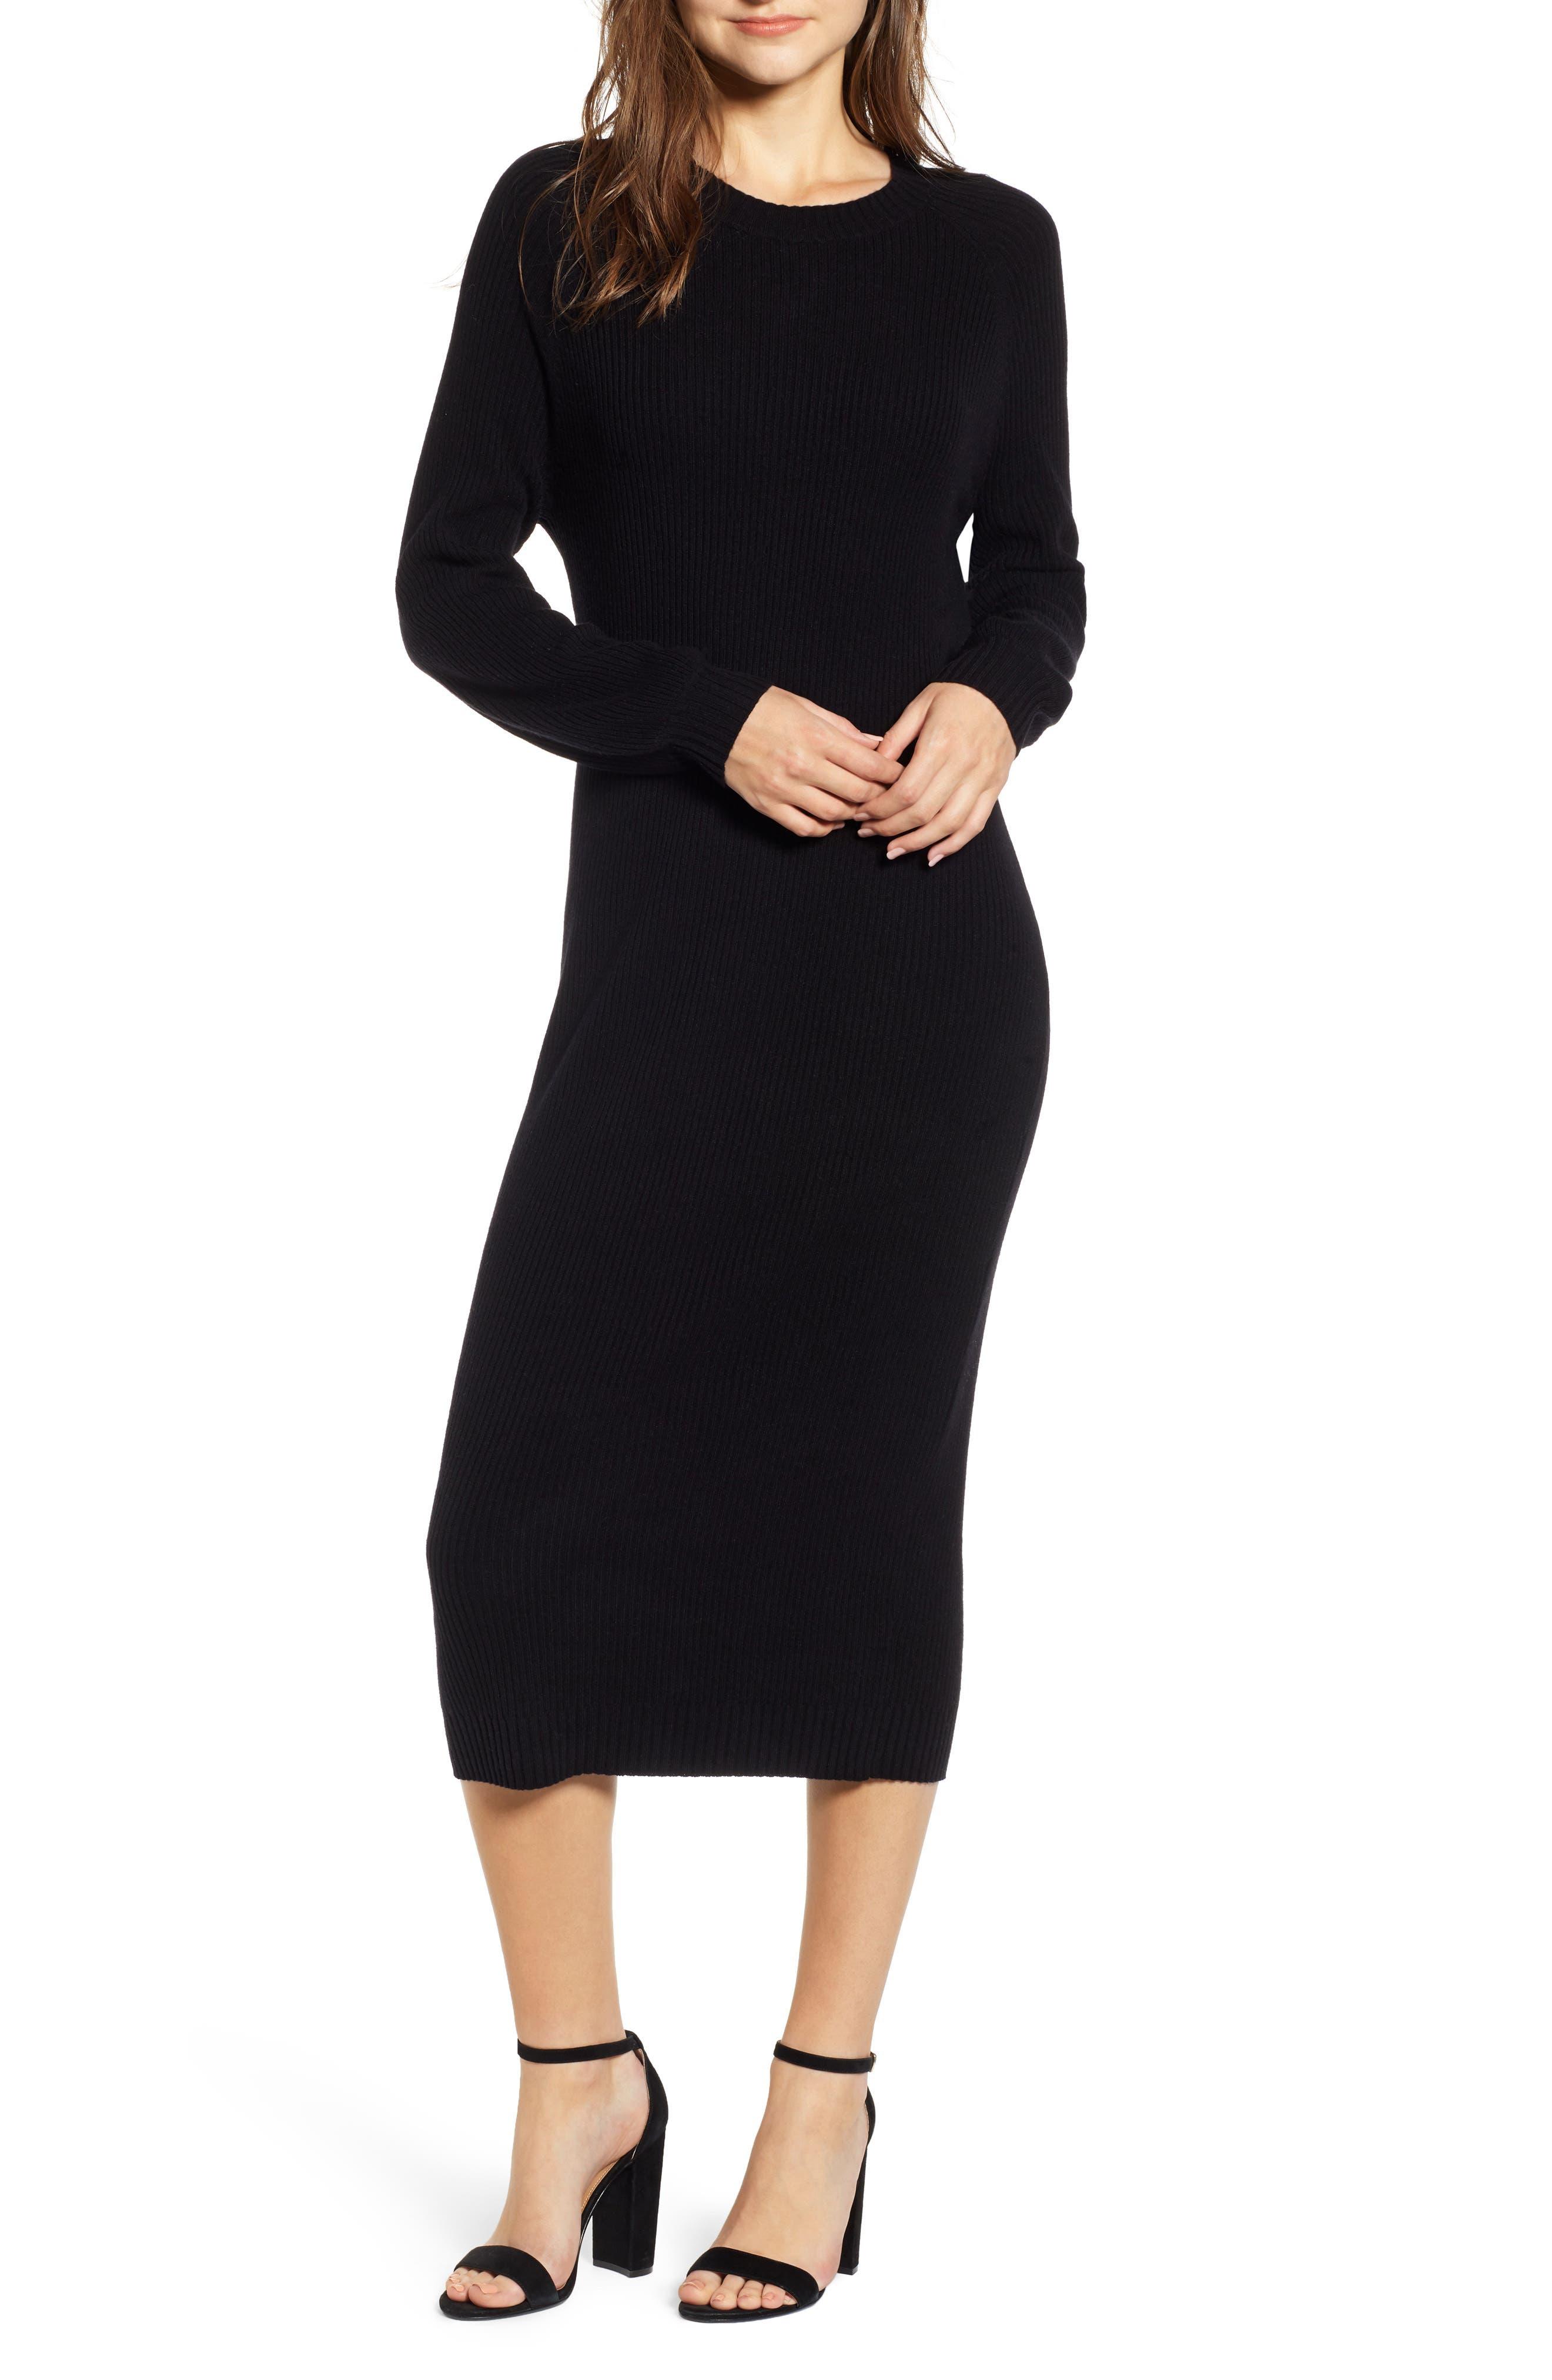 Quaid Knit Sweater Dress,                             Main thumbnail 1, color,                             TRUE BLACK